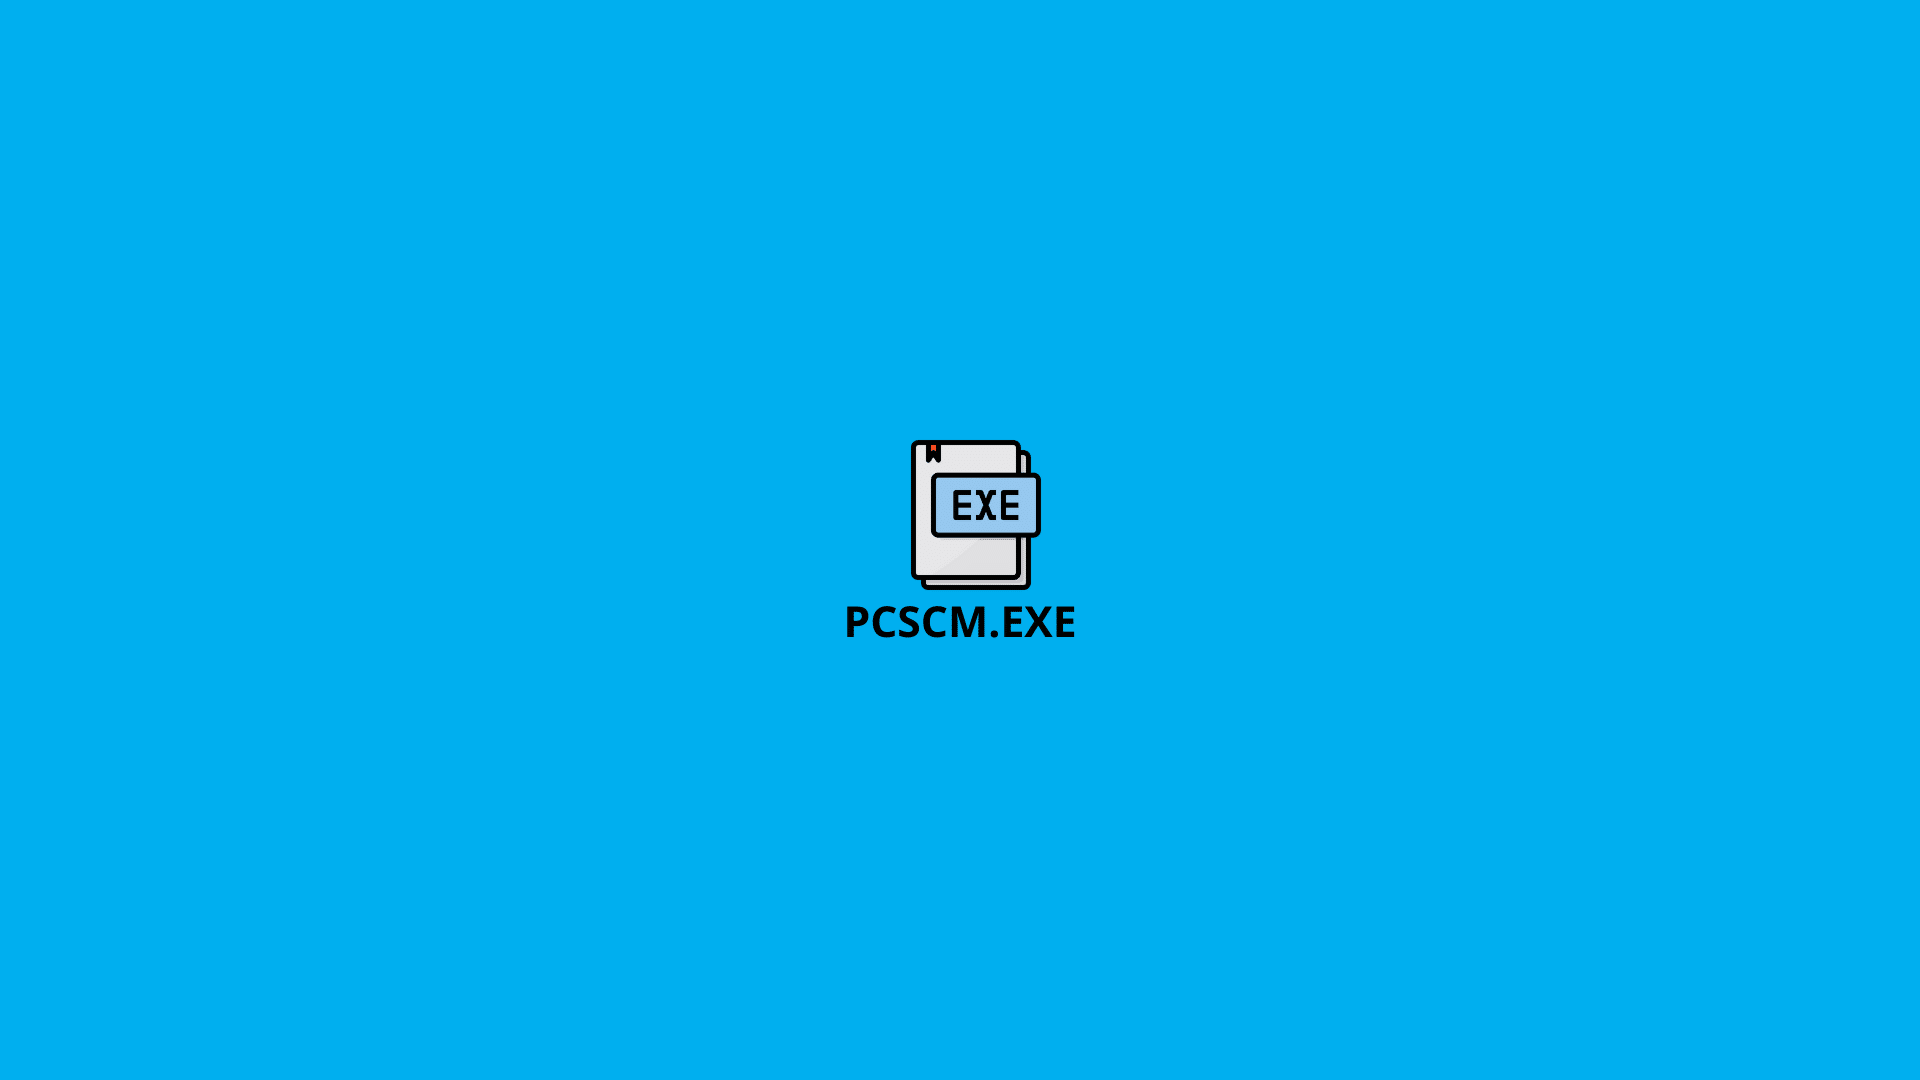 pcscm.exe